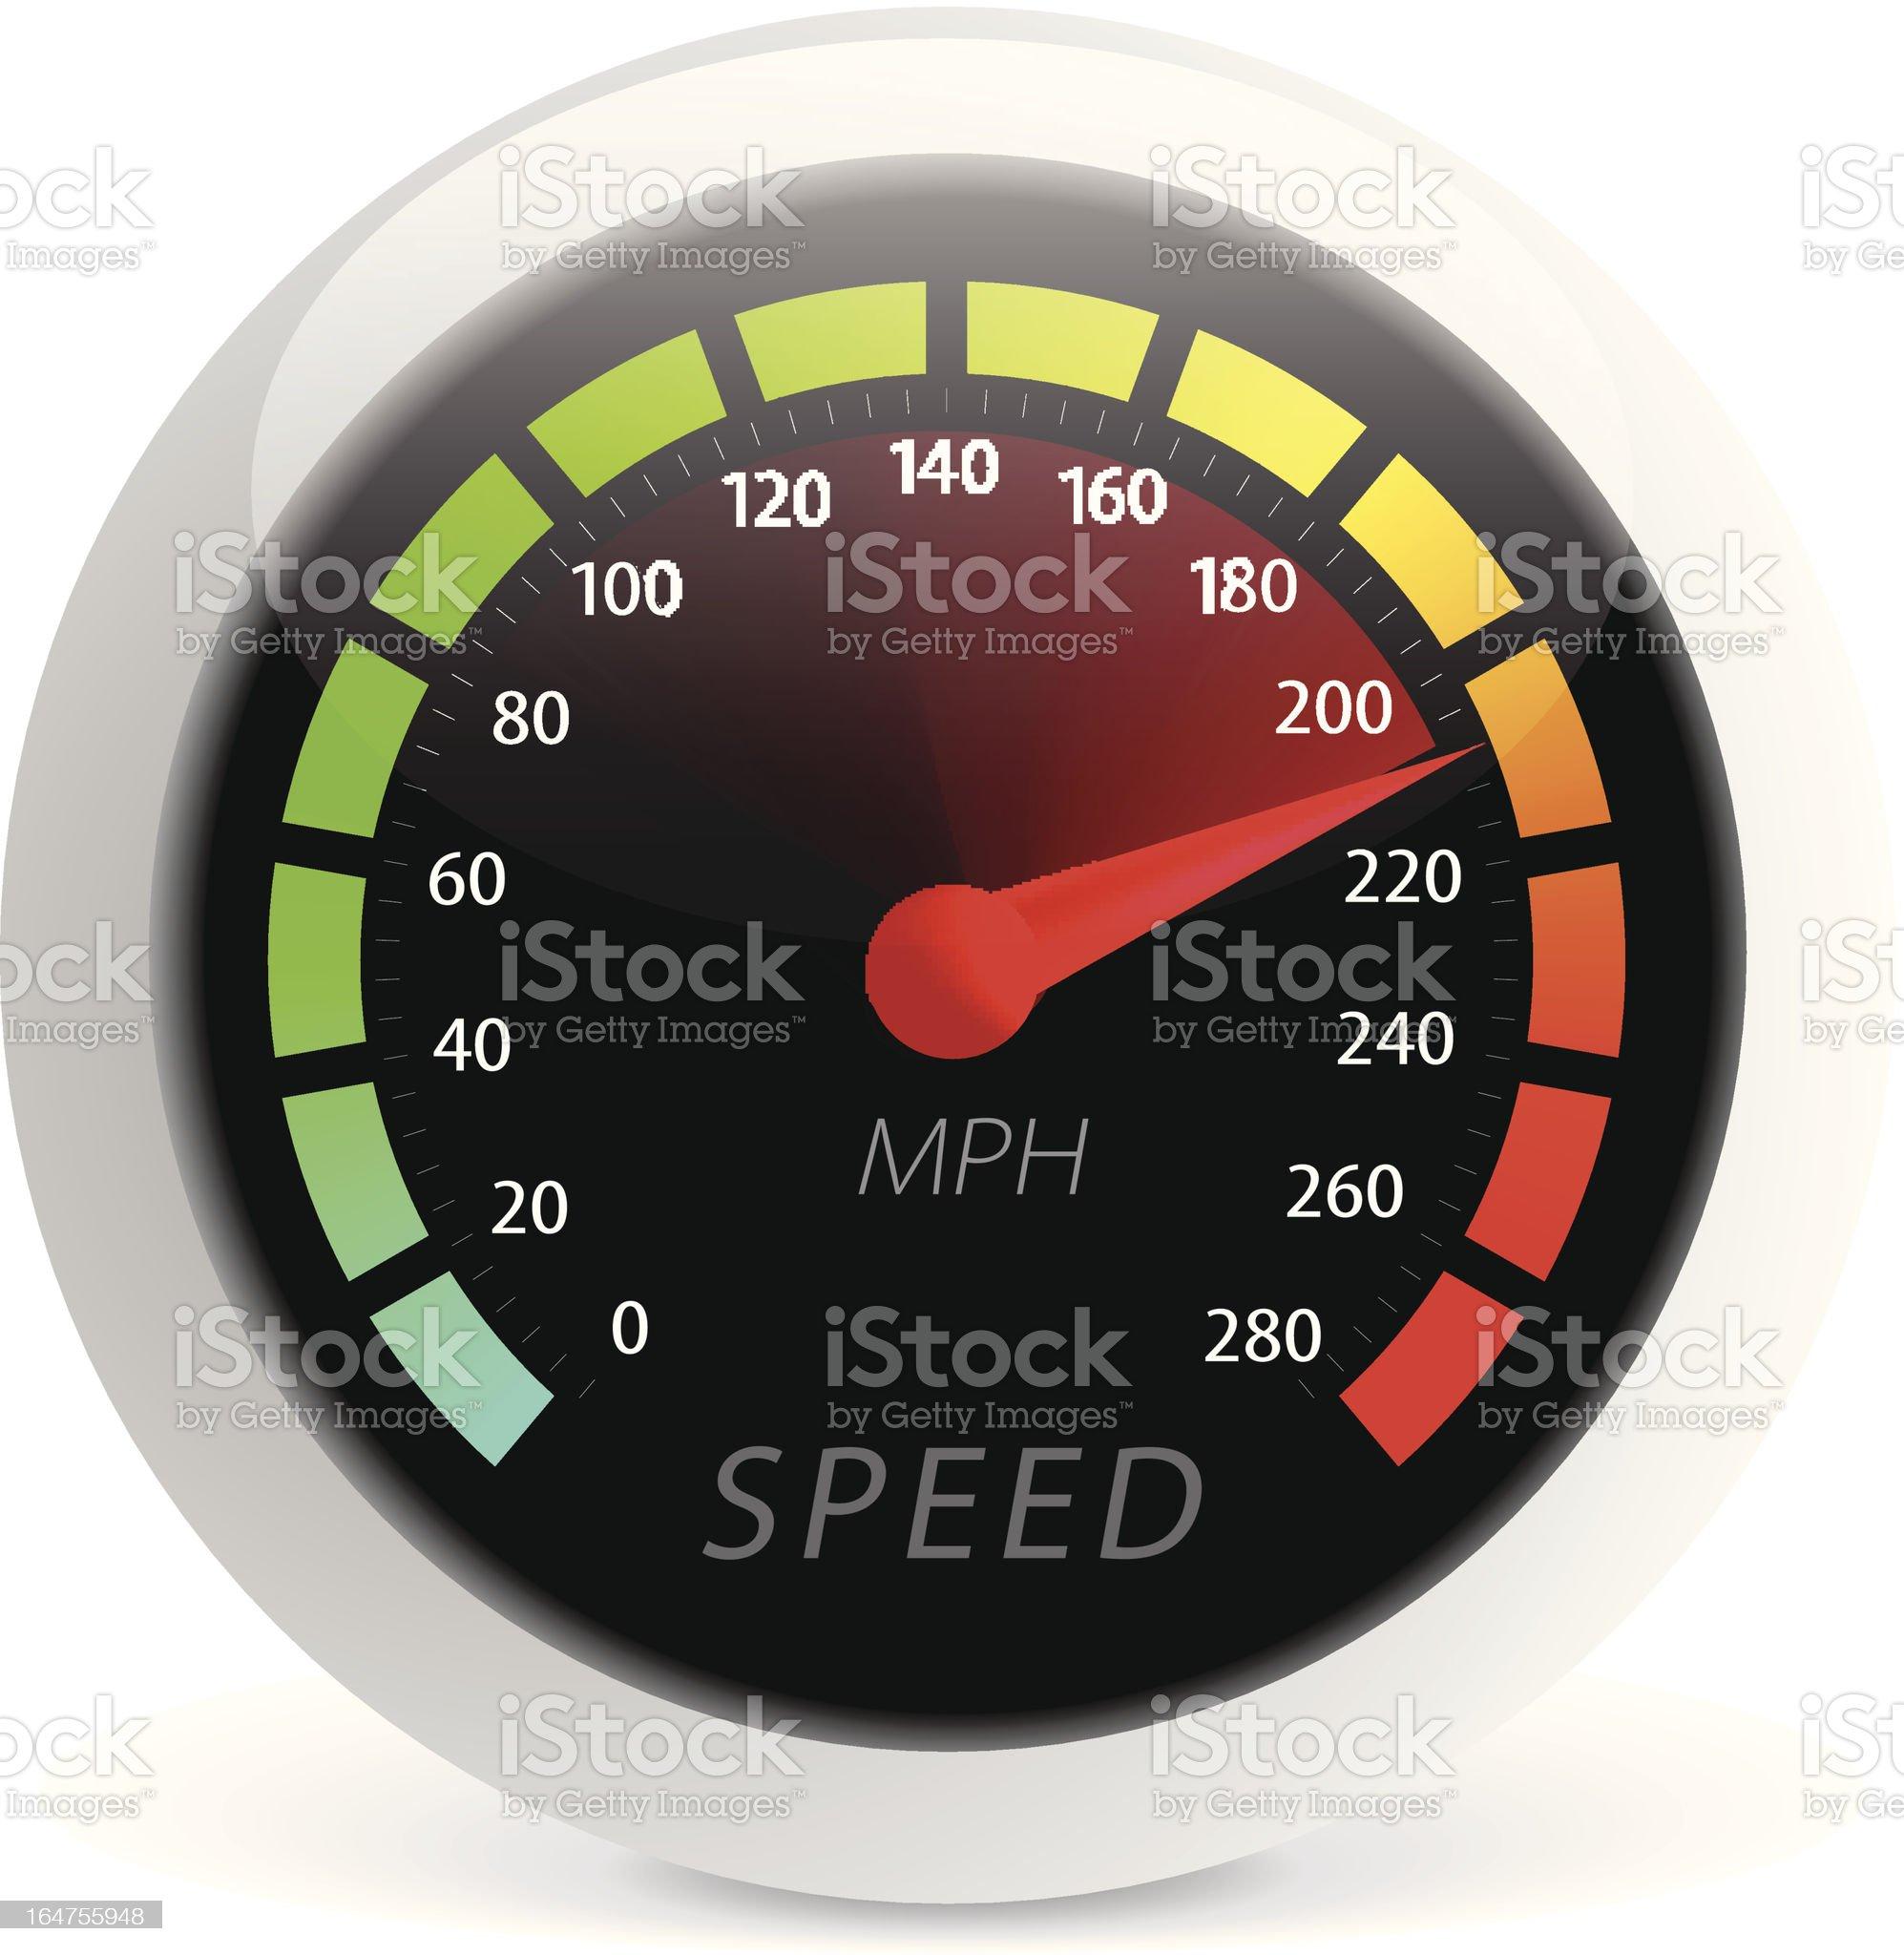 Speedometer vector illustration royalty-free stock vector art